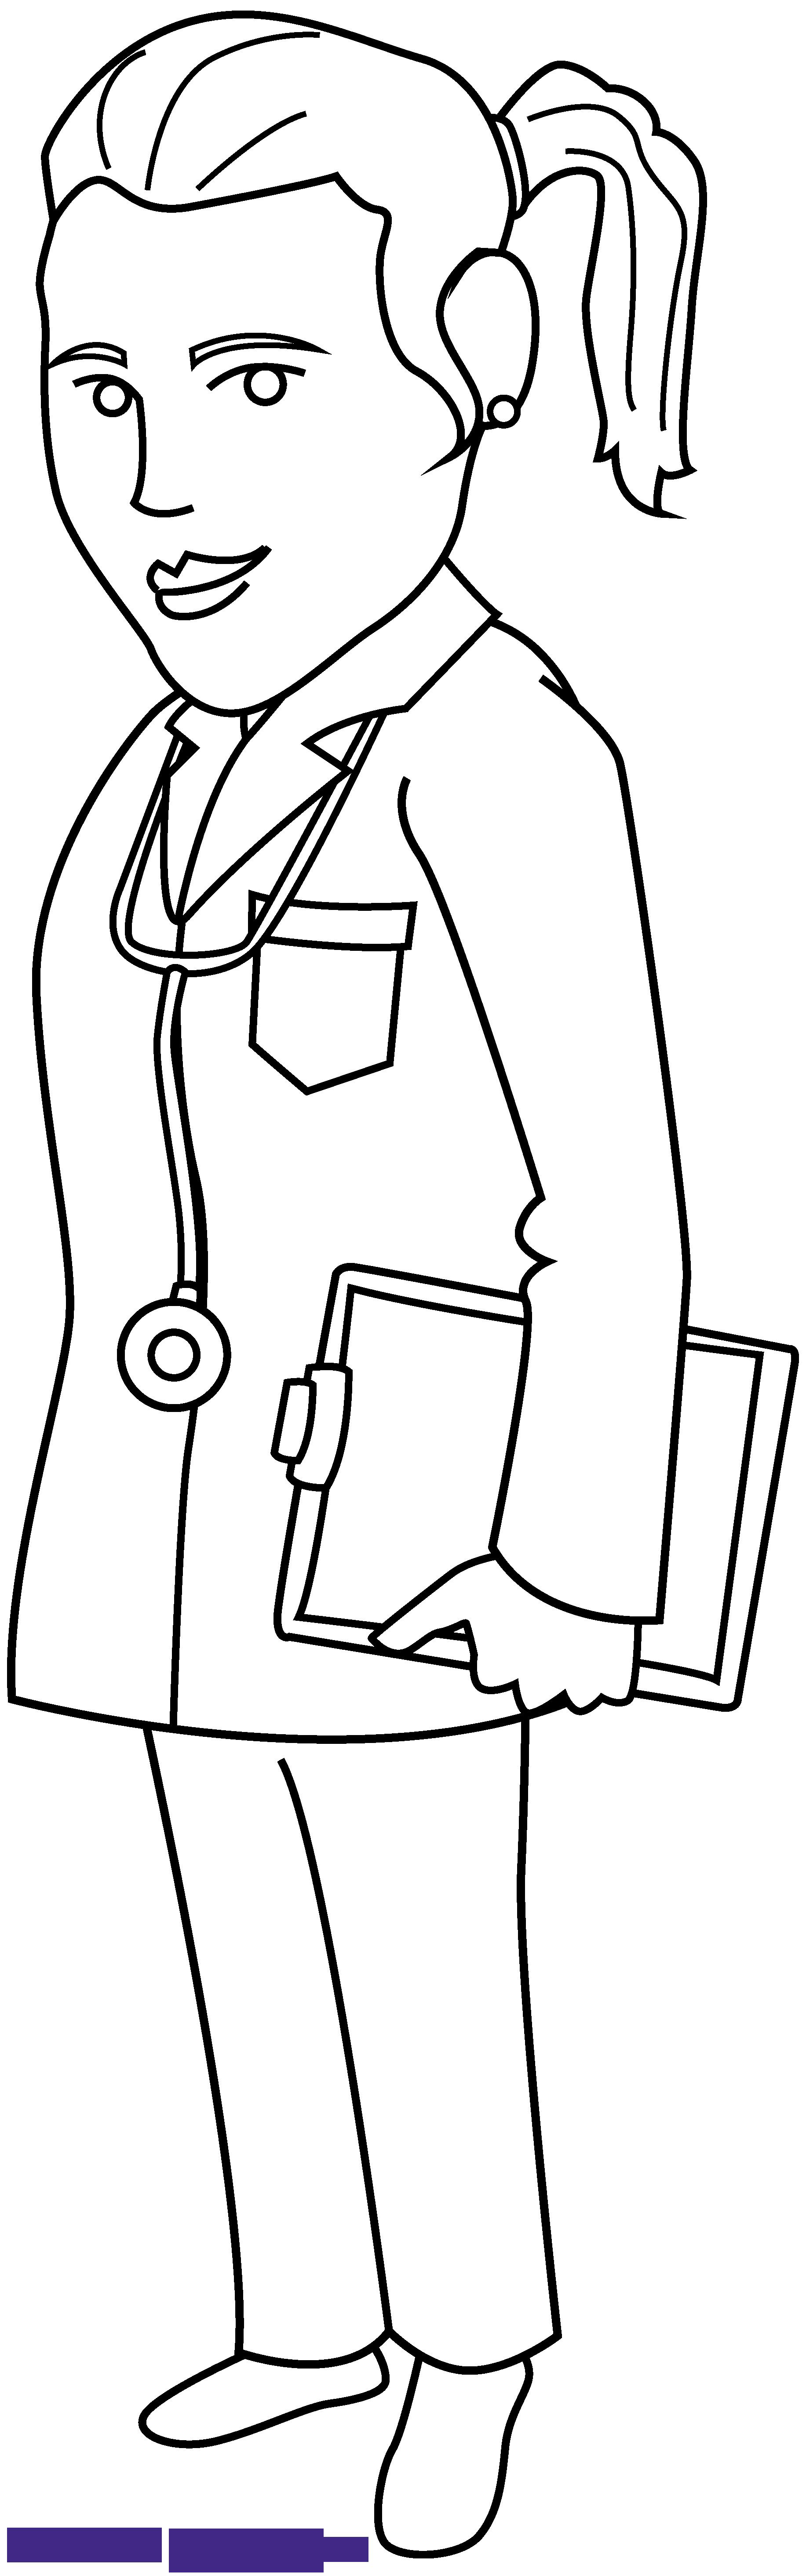 Line art sweet clip. Doctor clipart book